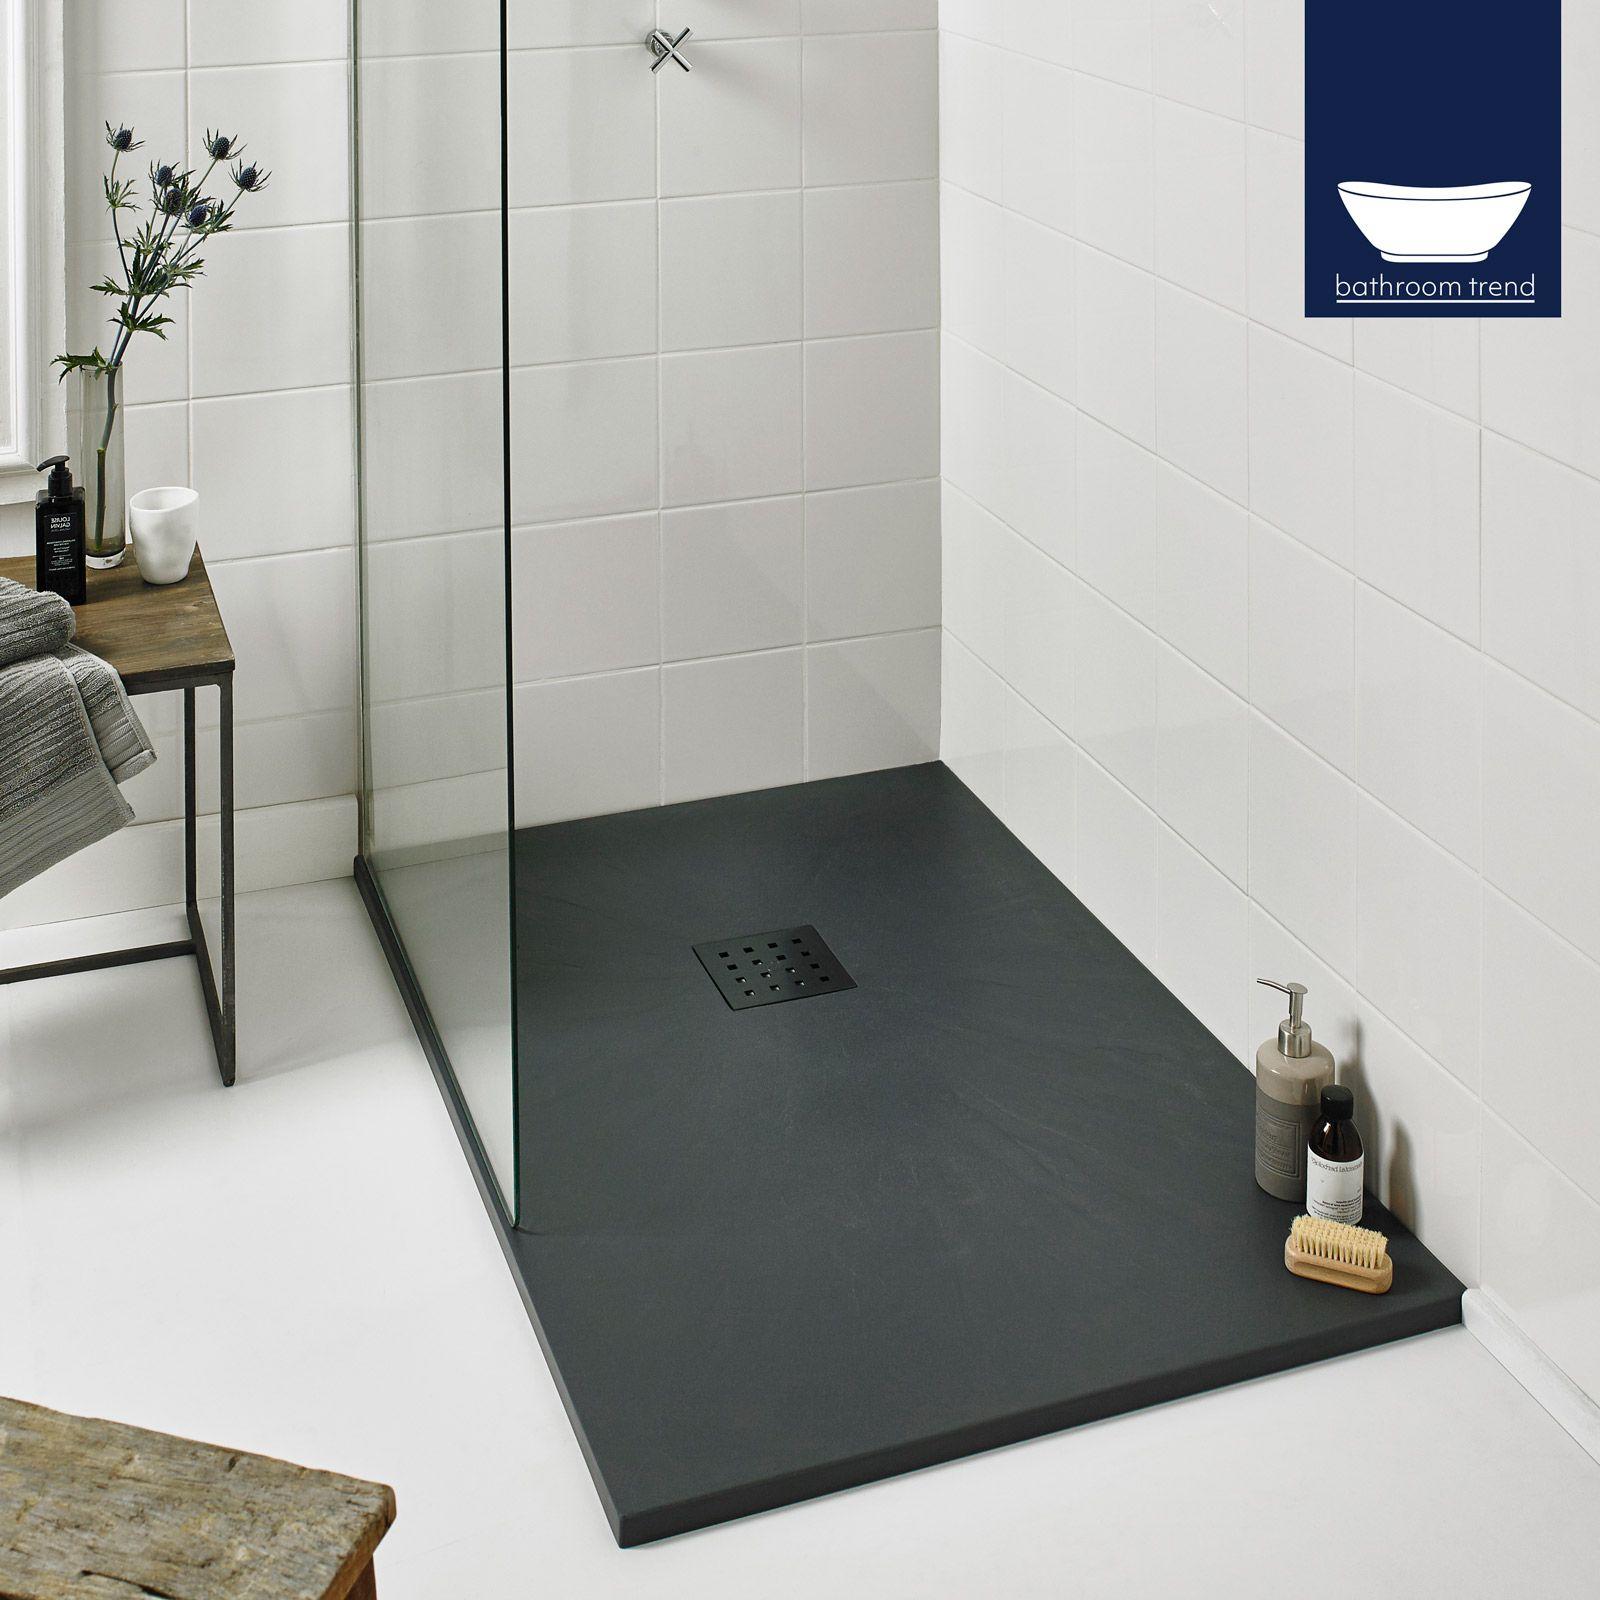 1200mm Rectangle Designer Shower Tray Modern Slate Effect With Integrated Waste Modern Slate Effect Shower Tray Bathroom Shower Tray Ideas Shower Tray